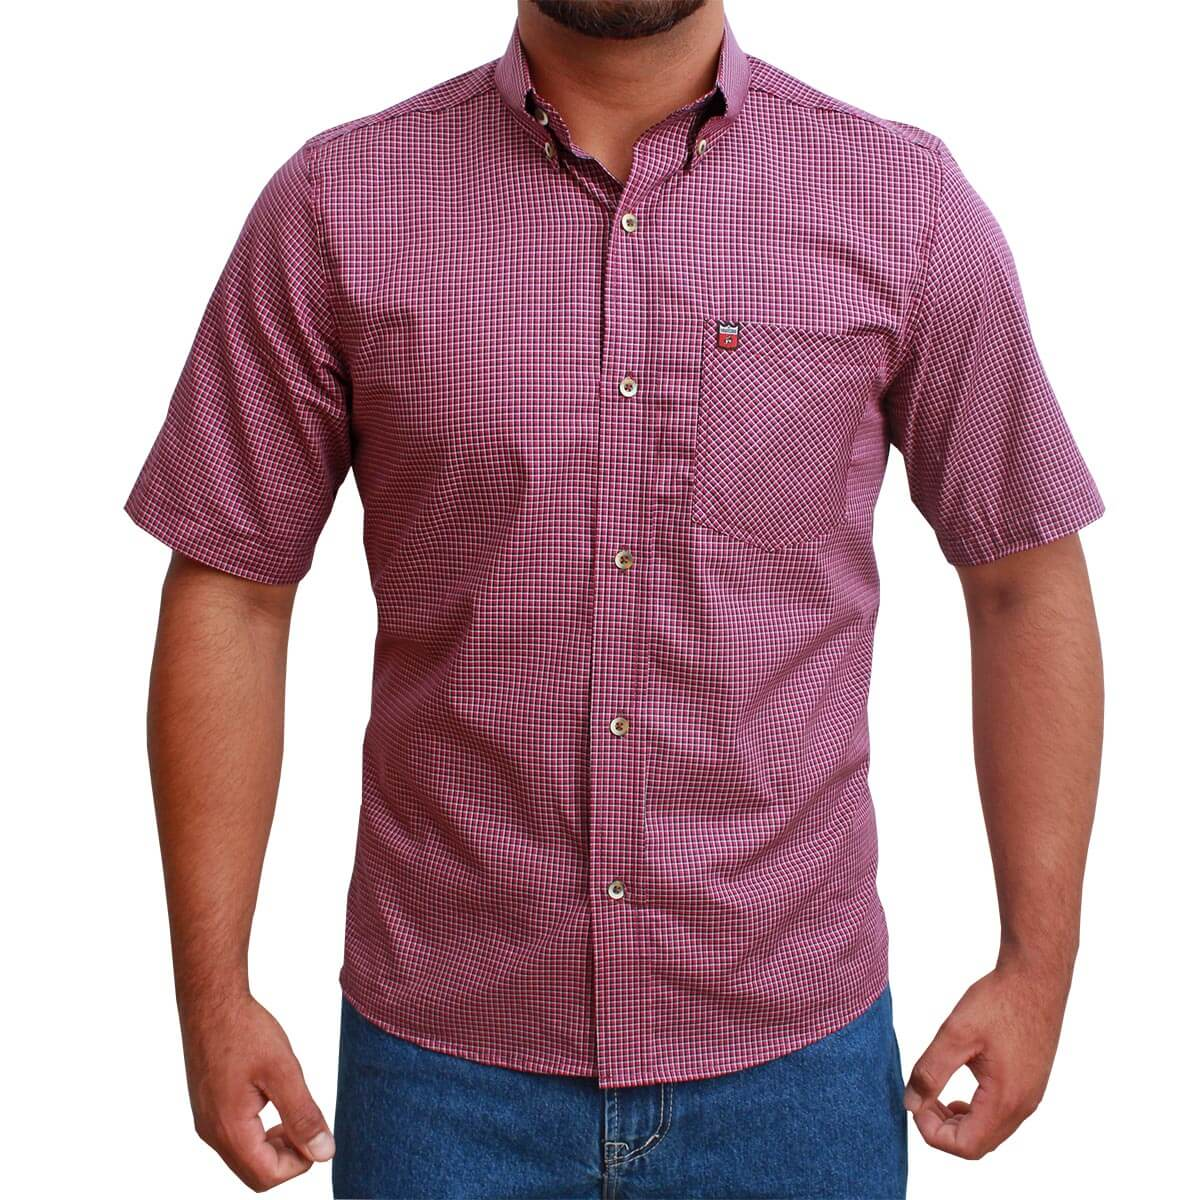 Camisa Manga Curta Os Vaqueiros Masculino Xadrez Roxo